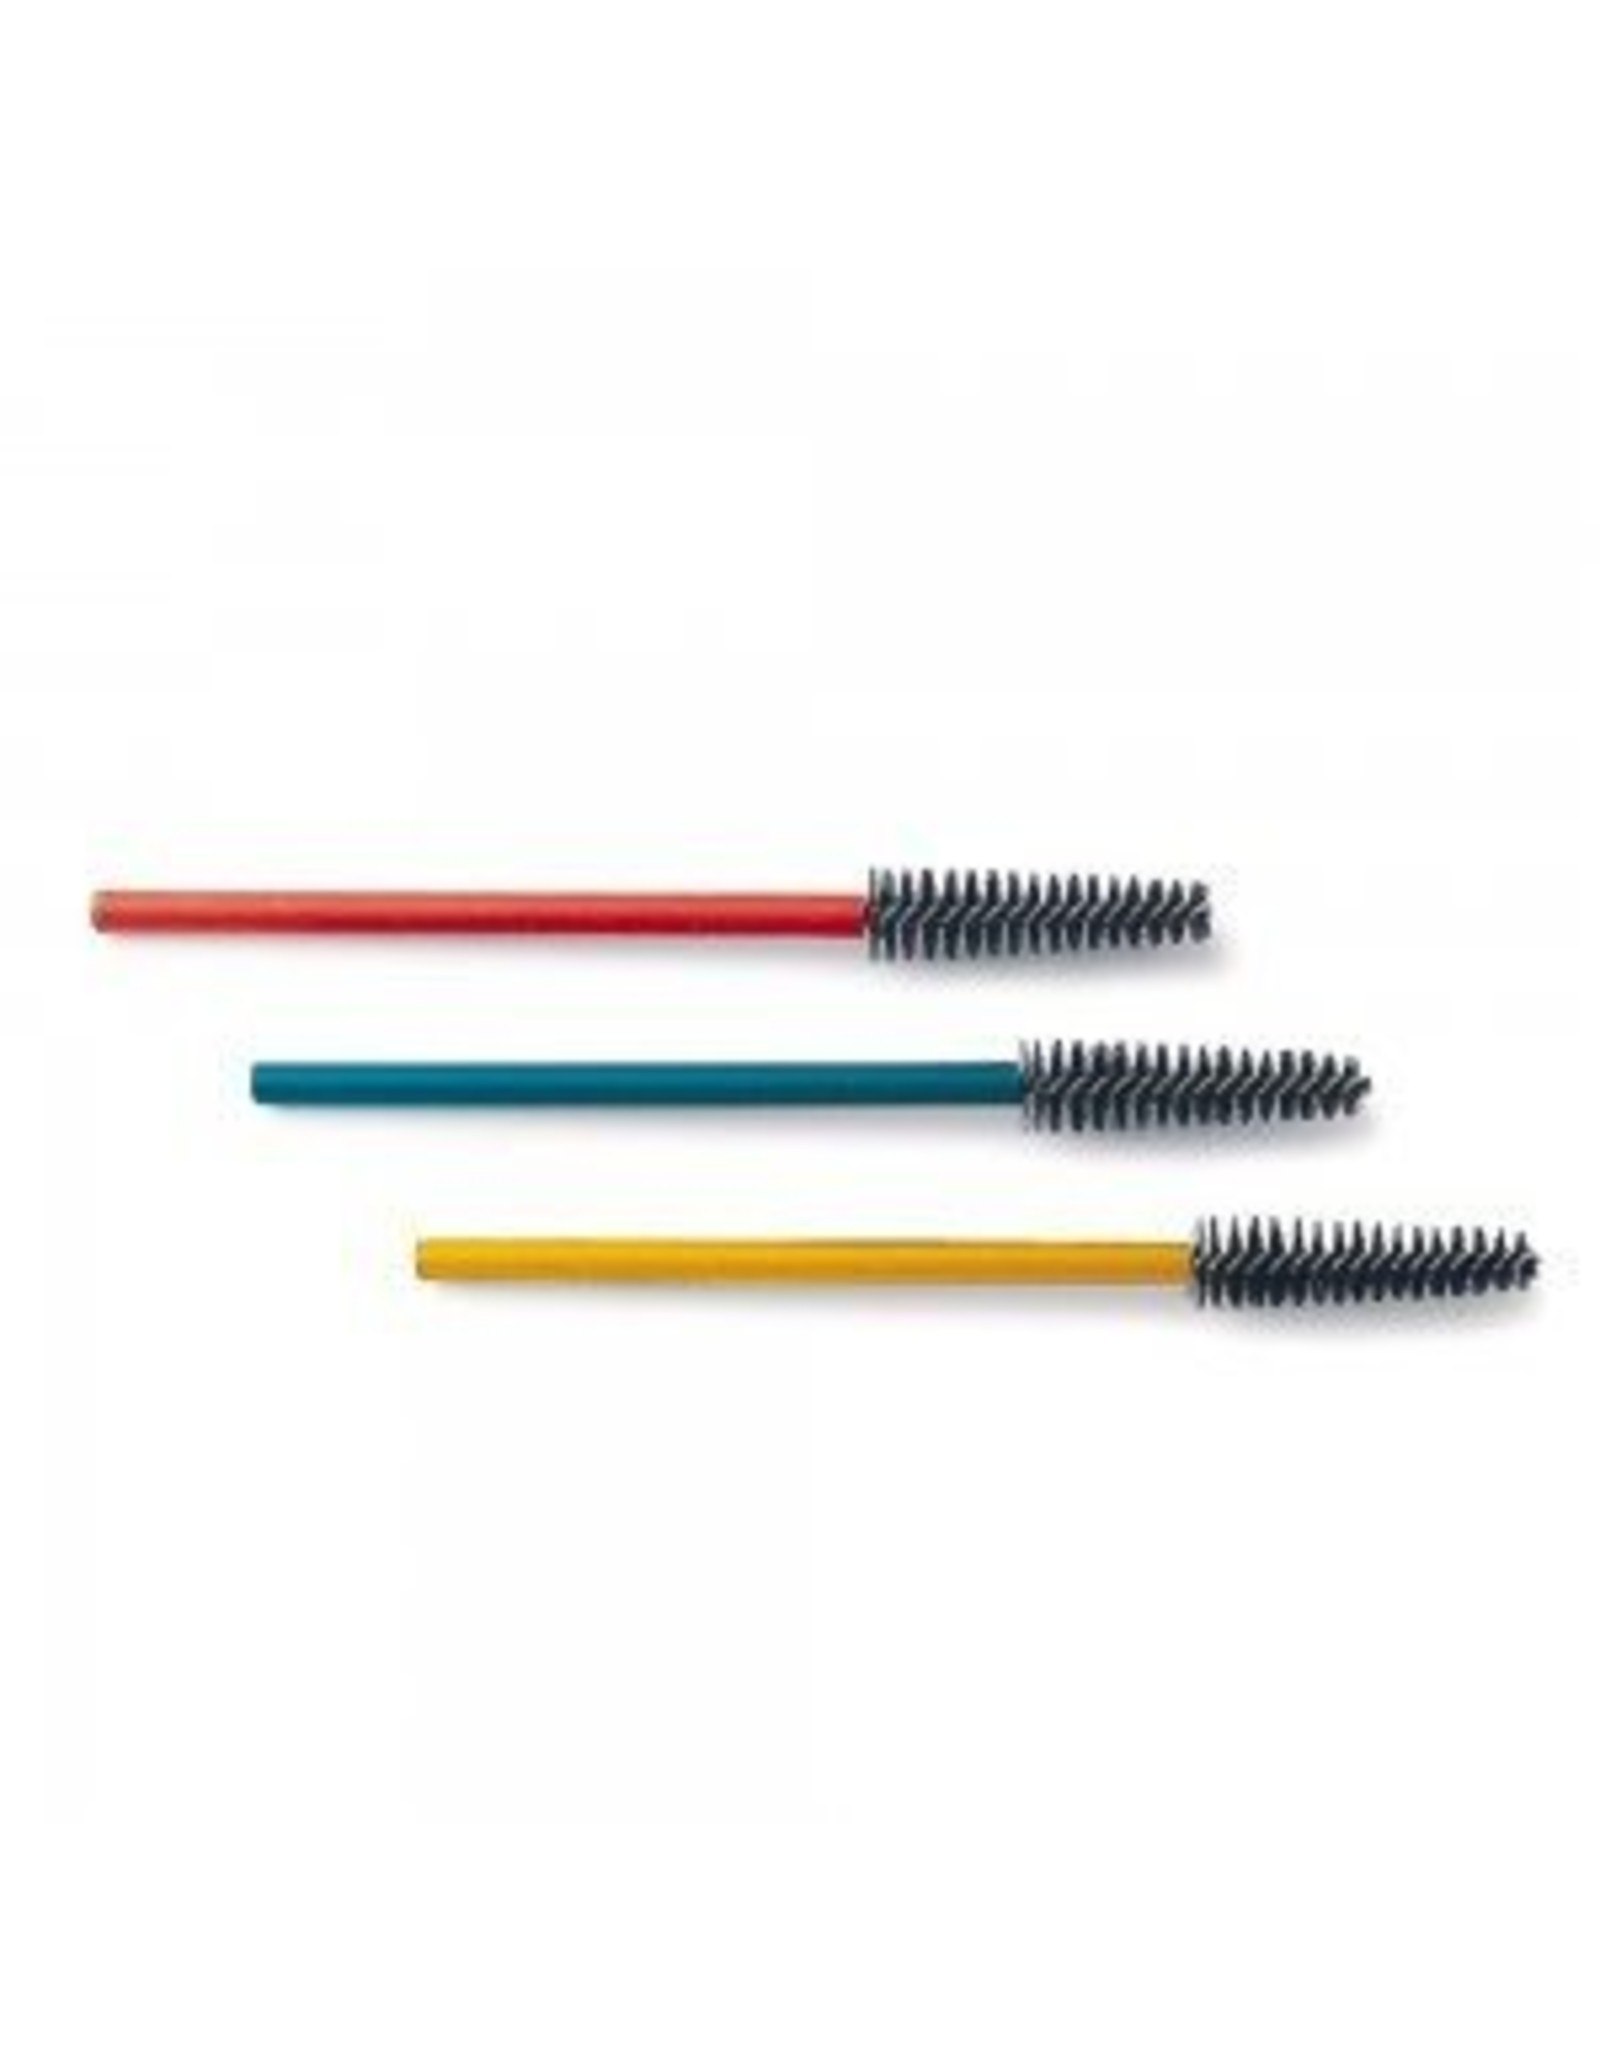 Droll Yankees Brush, Perfect Little Brush for hummingird feeders, DYPLB